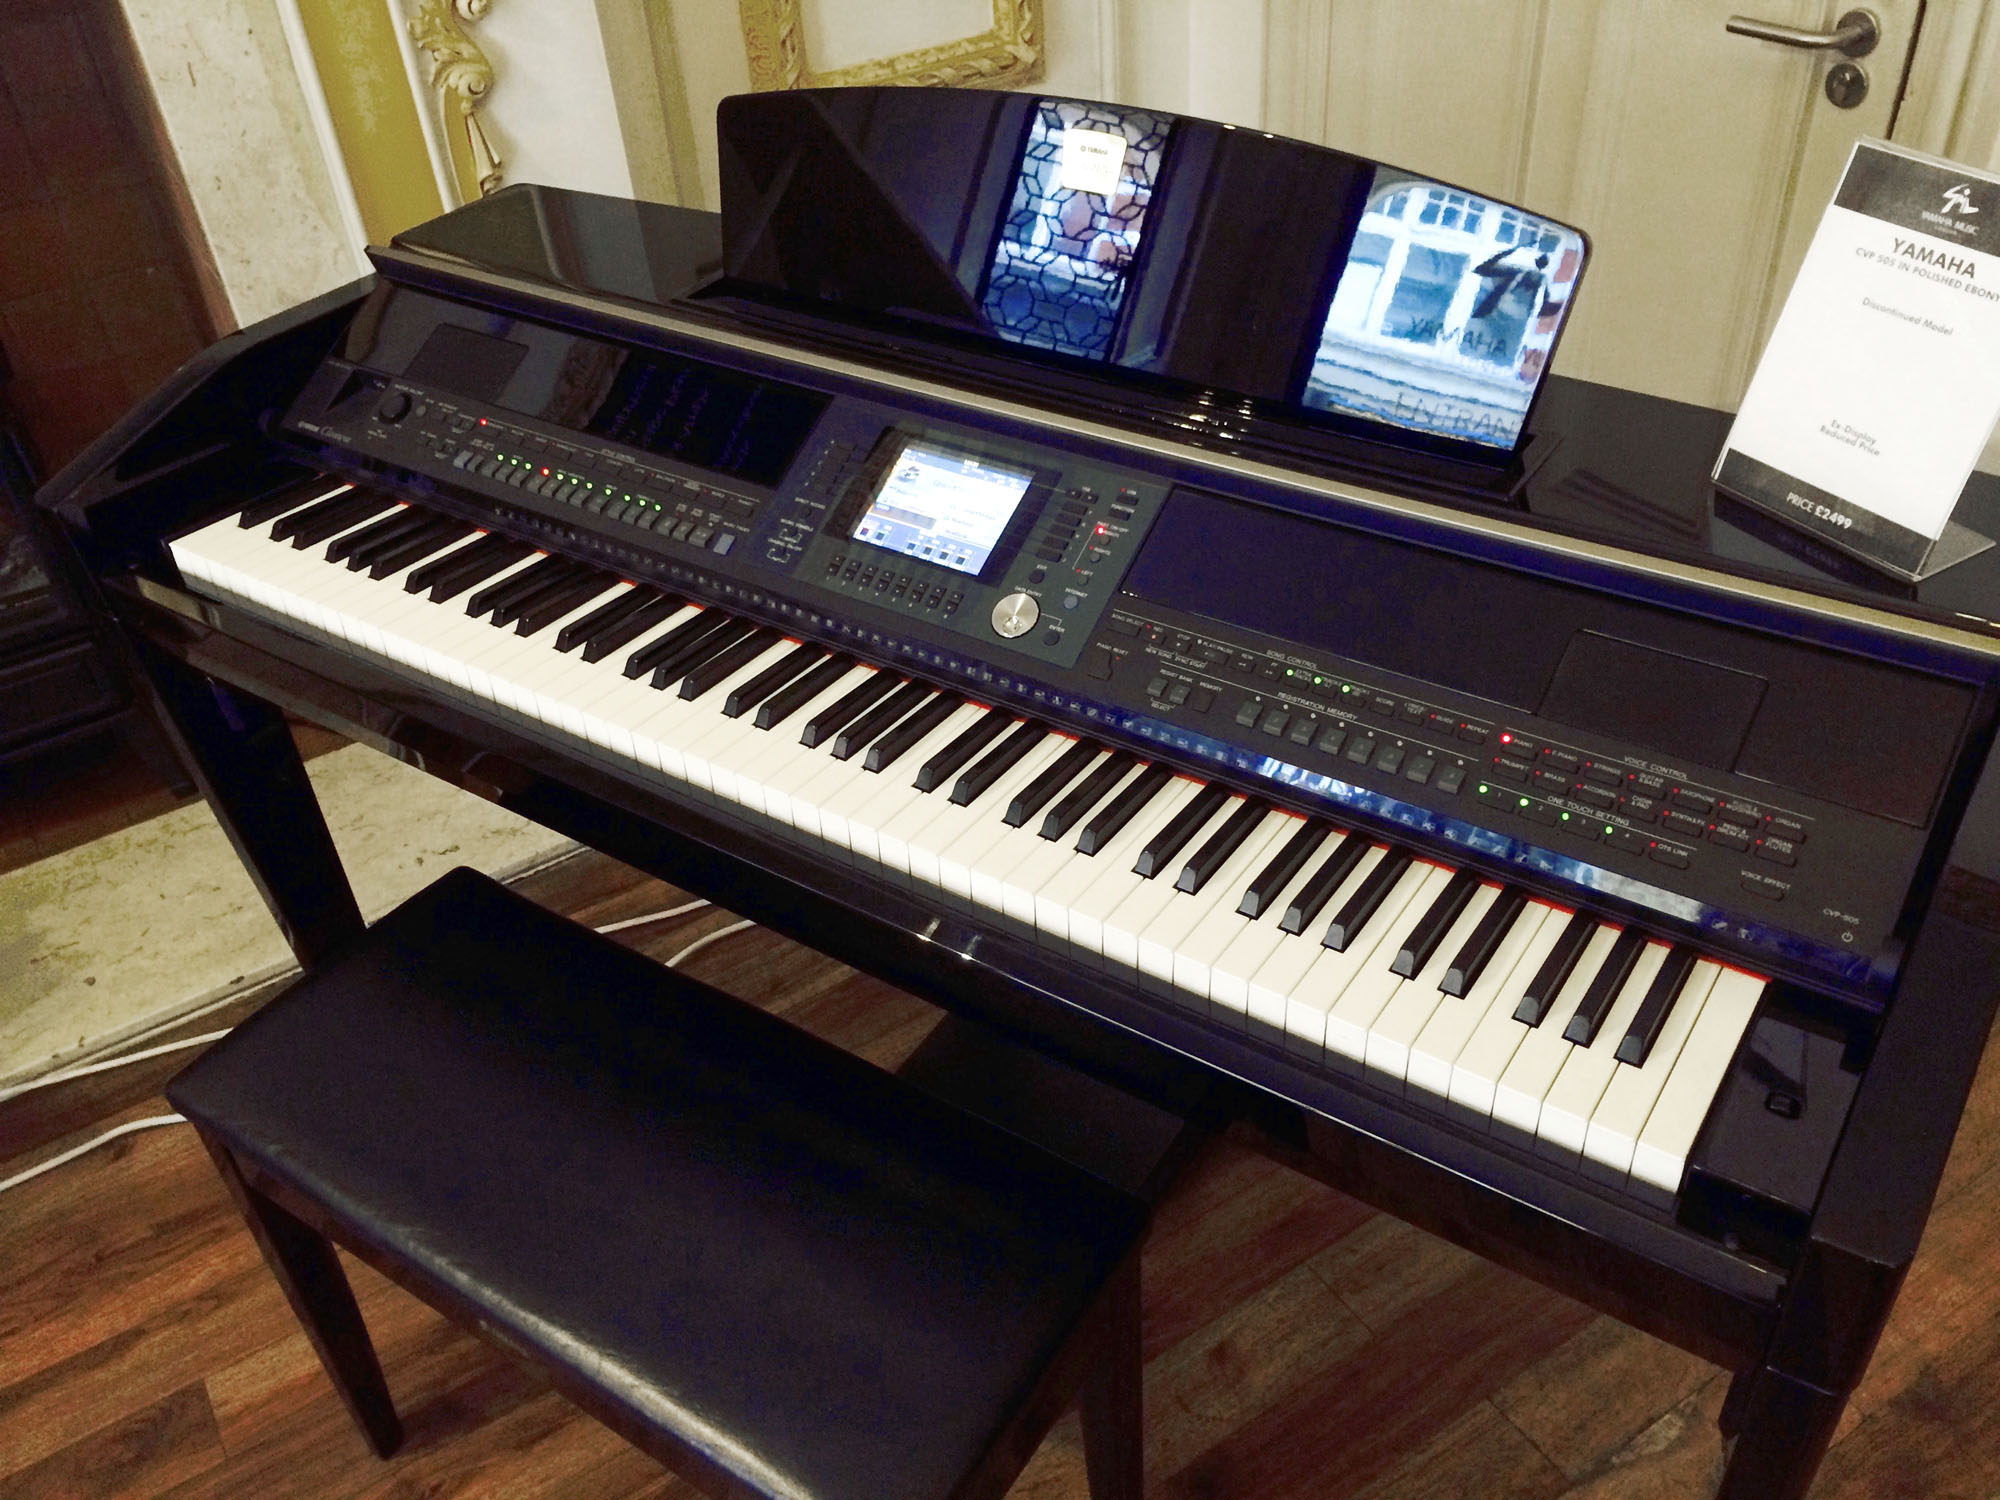 yamaha ex display cvp505 clavinova digital piano in. Black Bedroom Furniture Sets. Home Design Ideas